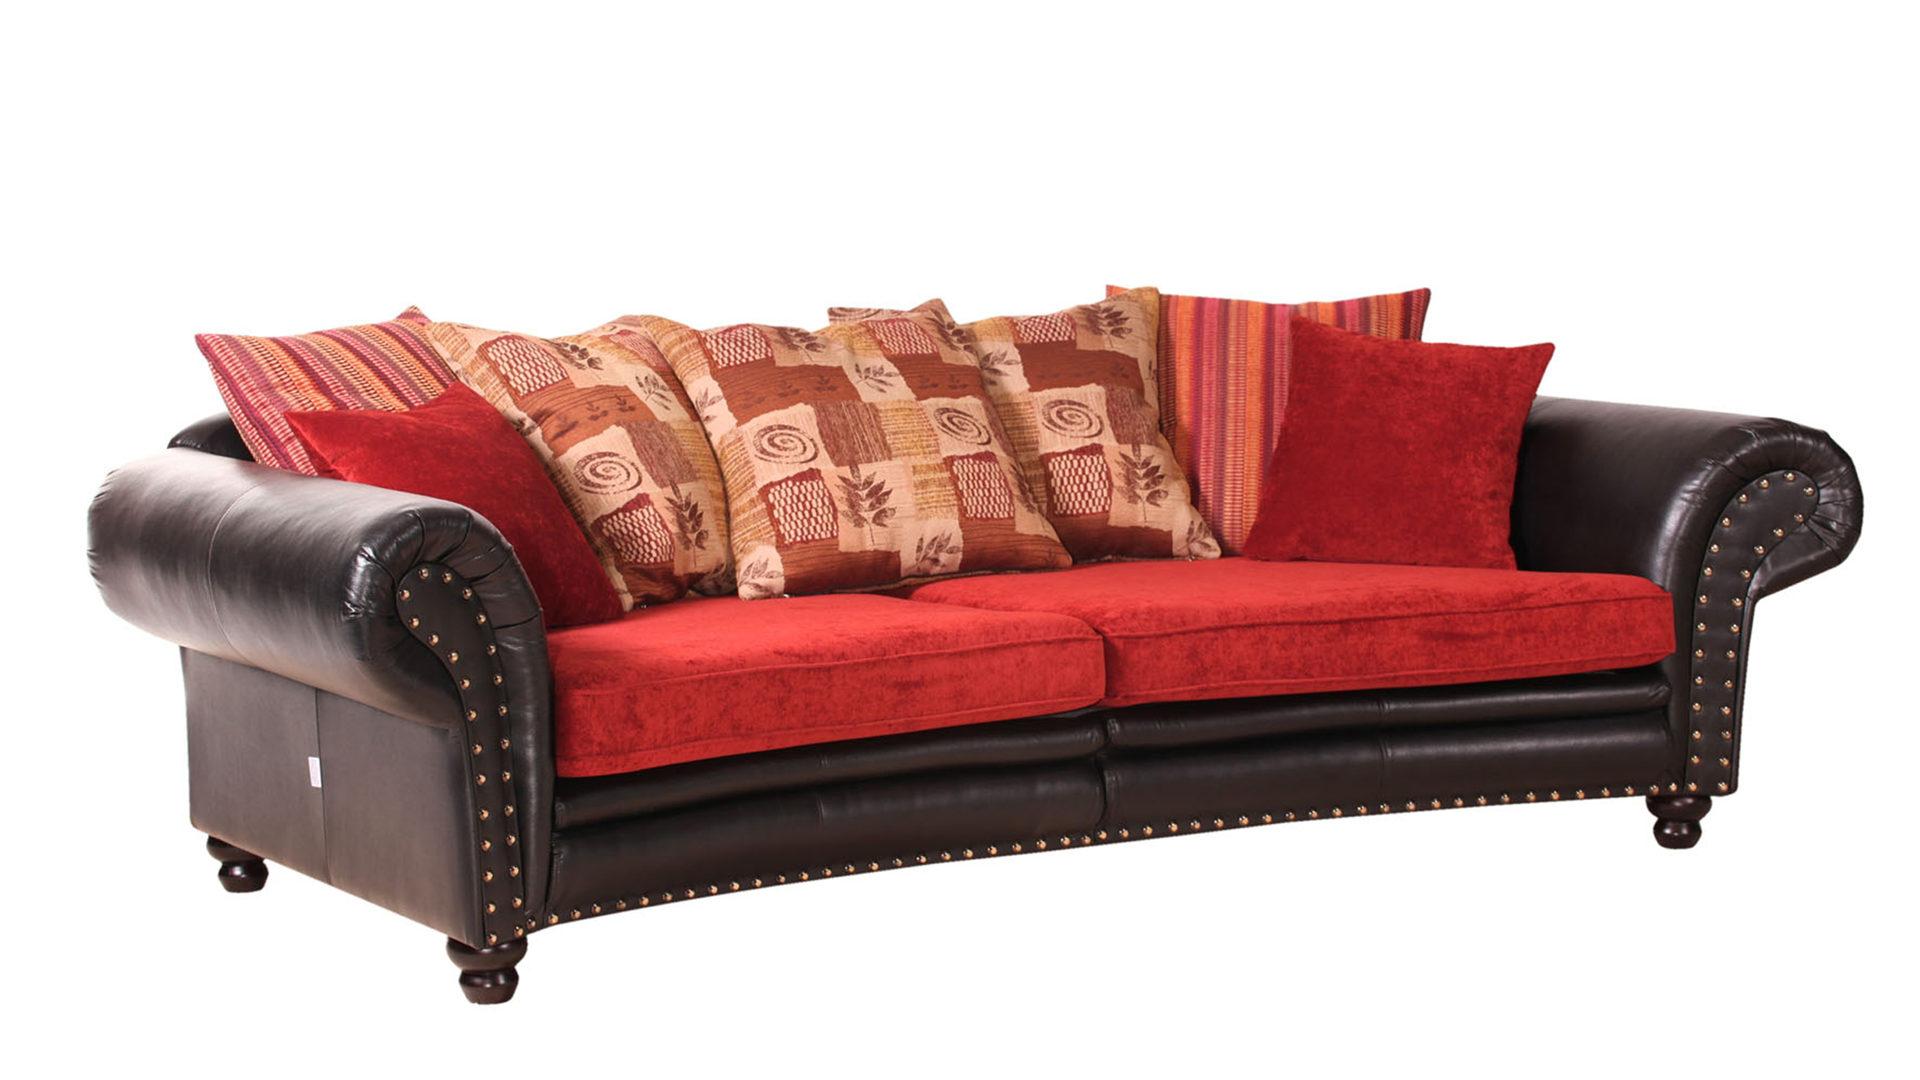 bbm wittstock | markenshops | standort wittstock | sofa colonial ... - Kolonial Living